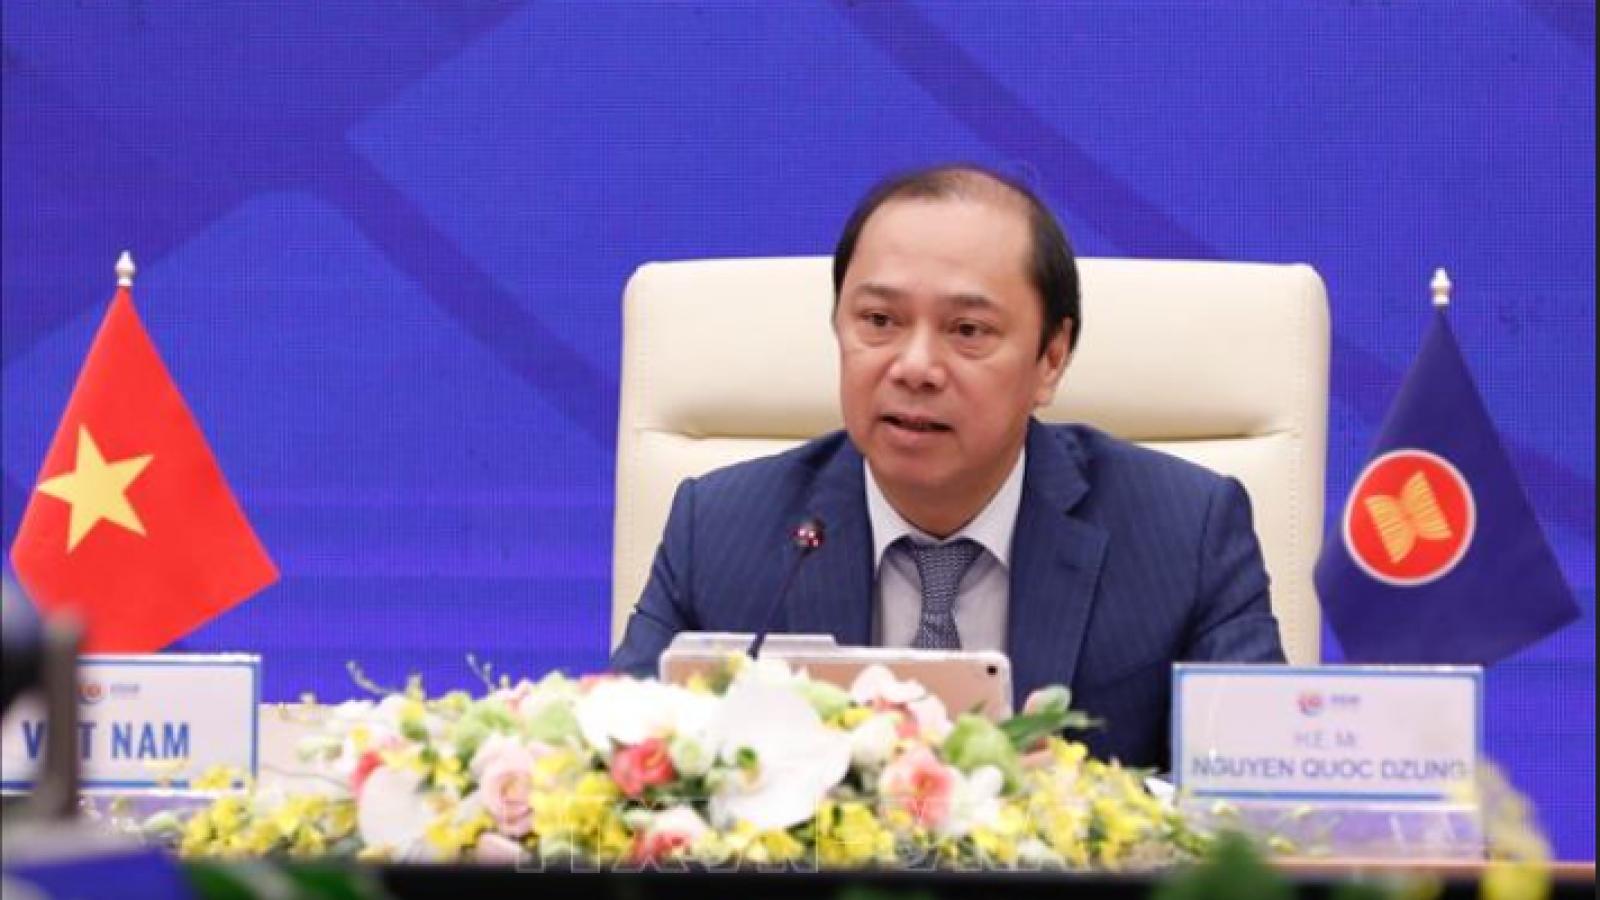 Quan chức cao cấp ASEAN họp trù bị cho Hội nghị cấp cao ASEAN 37